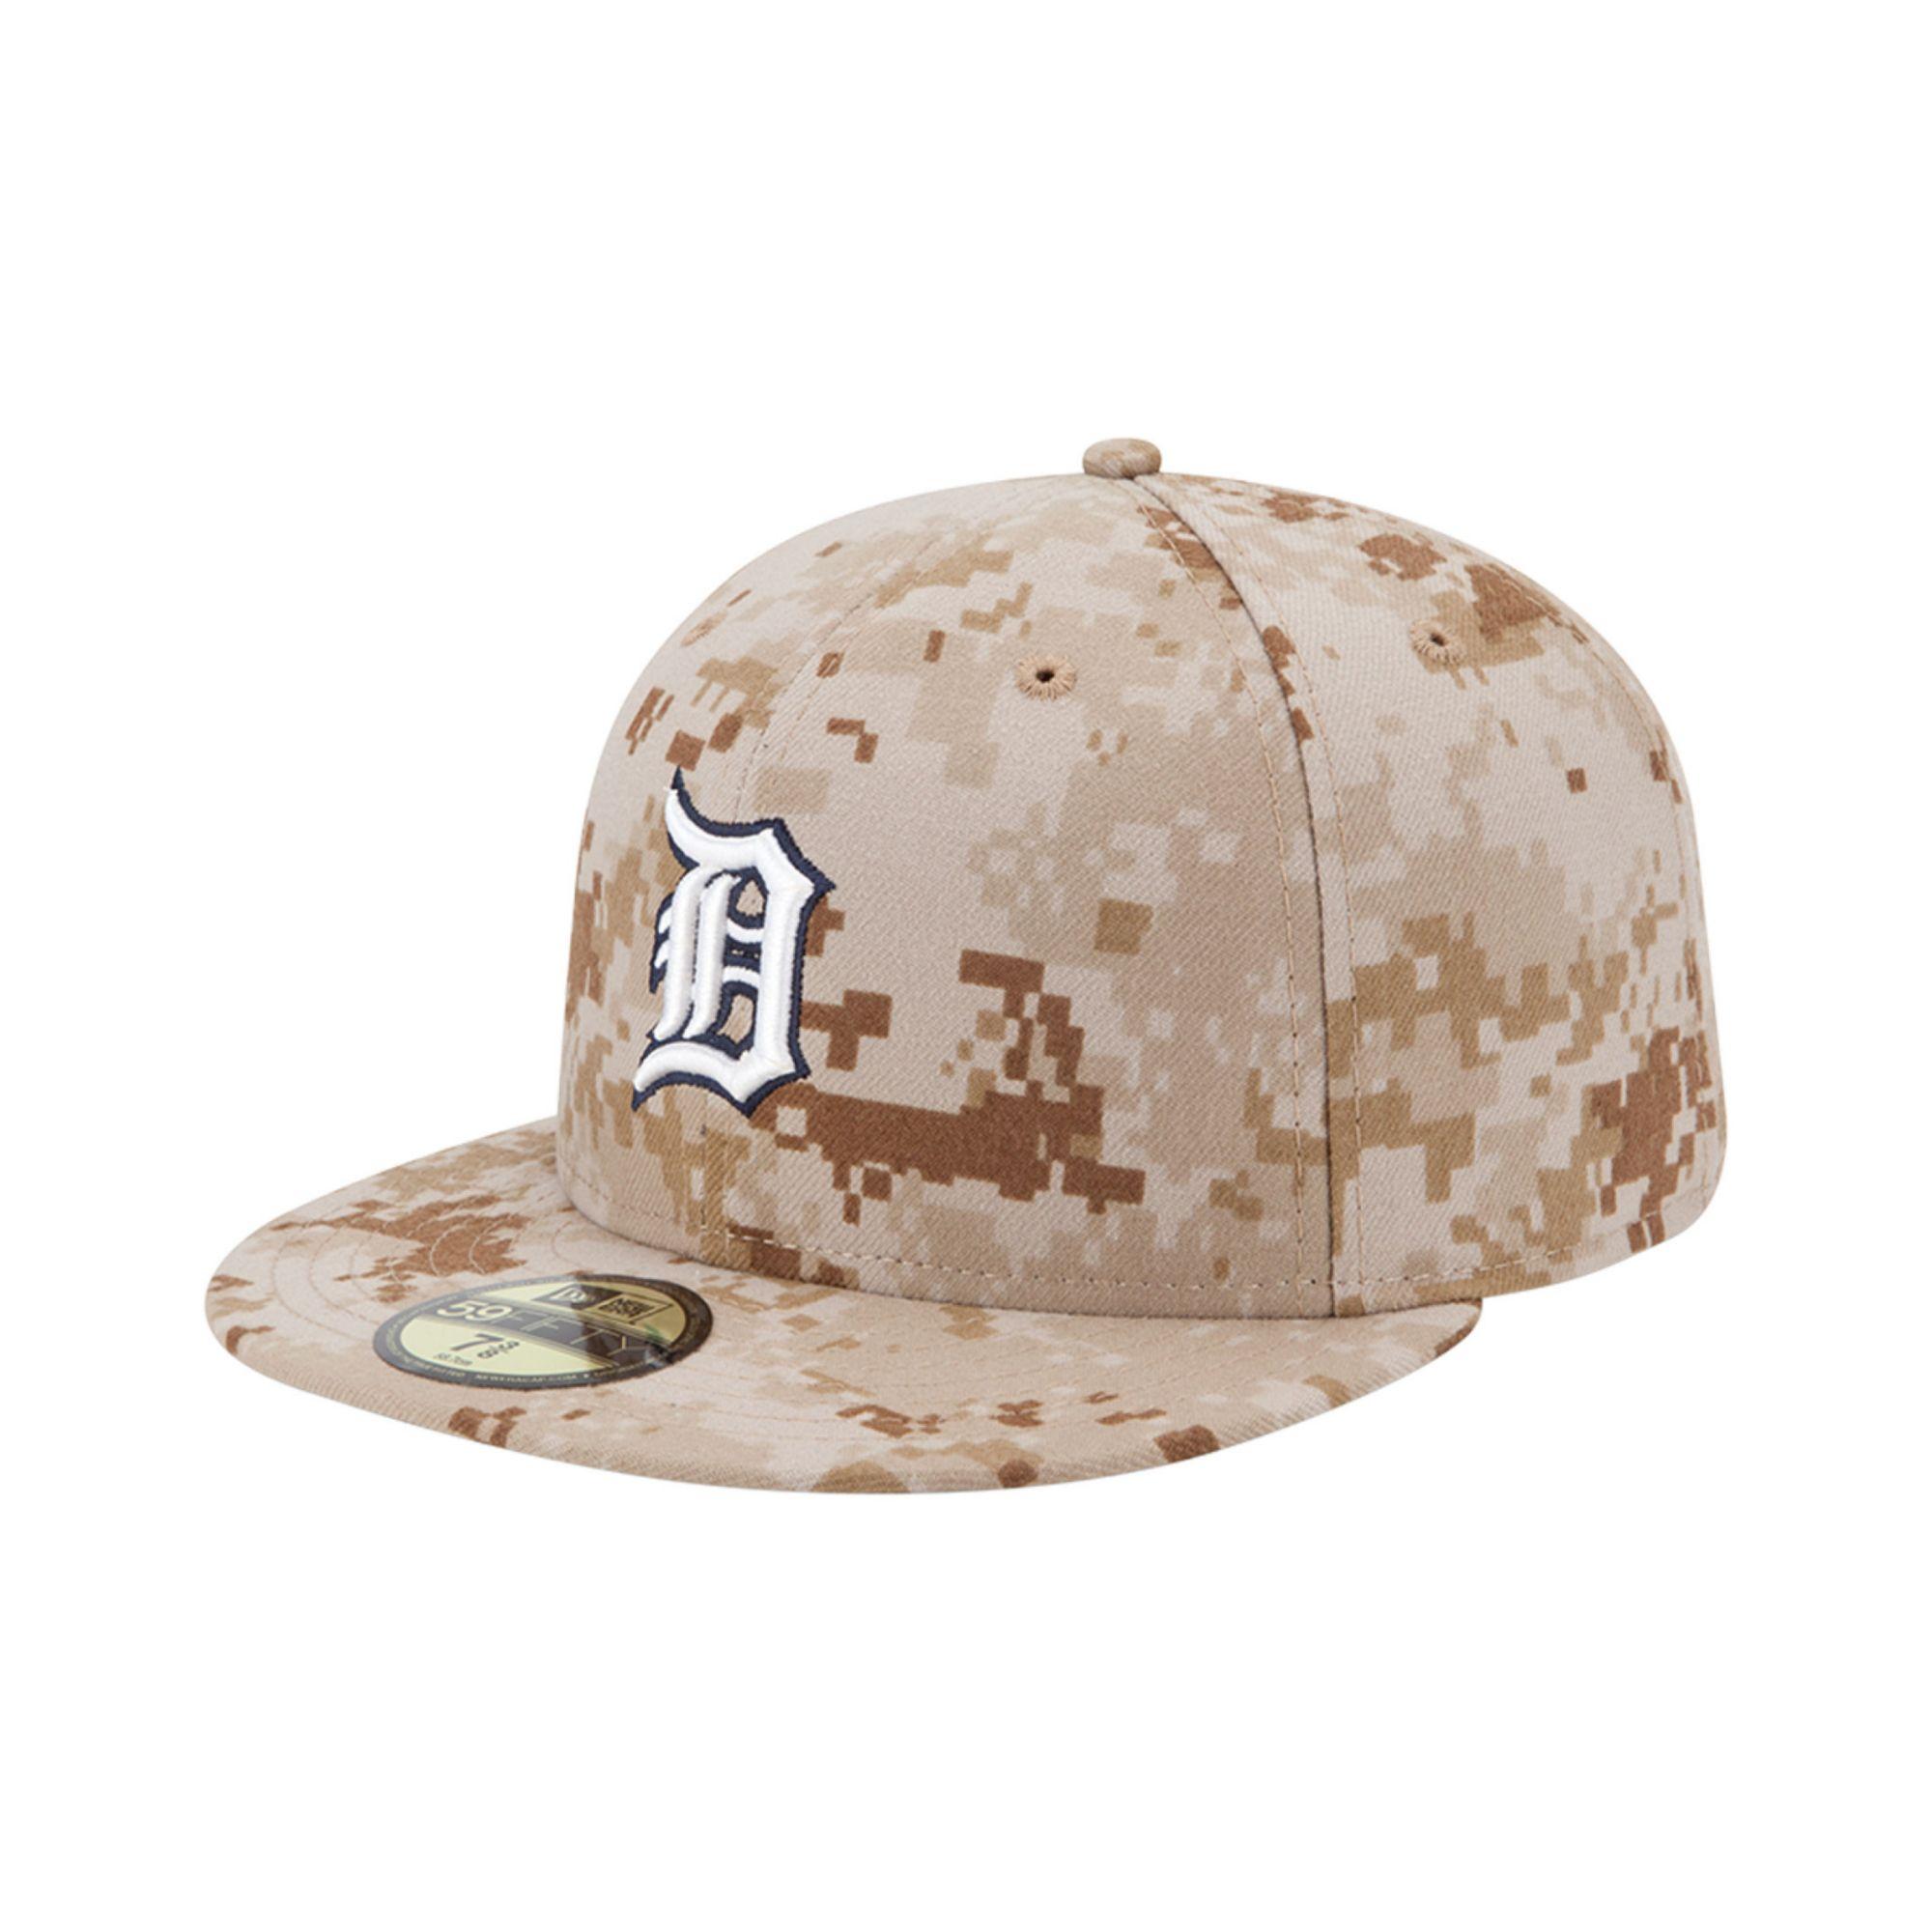 wholesale dealer afaa2 36f6e KTZ Detroit Tigers Mlb Memorial Day Stars Stripes 59fifty Cap in ...